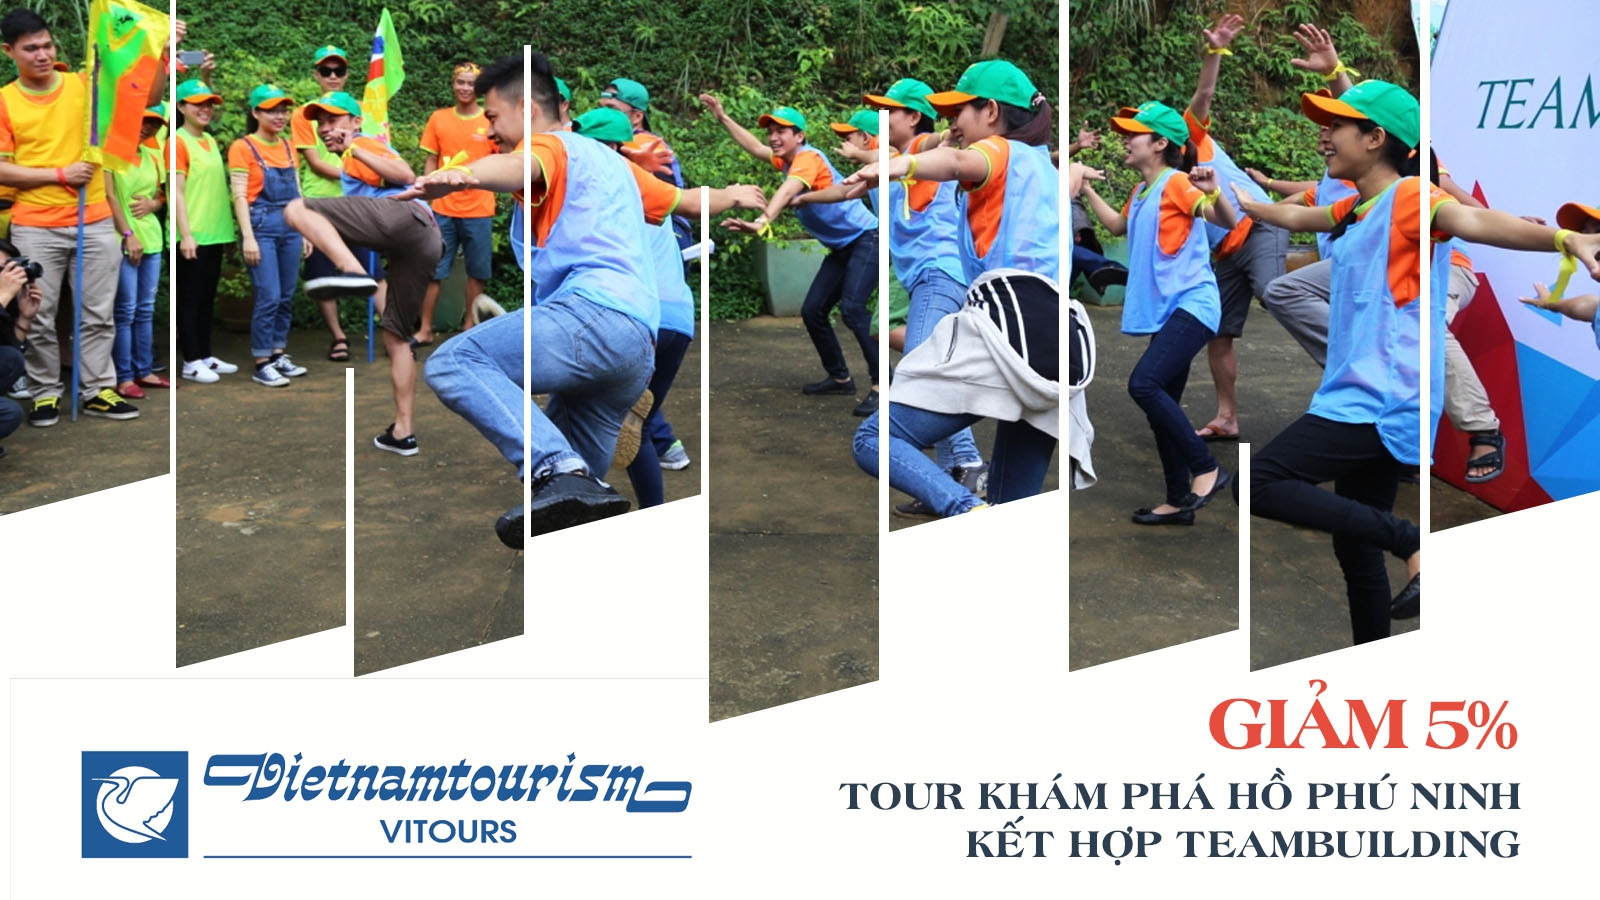 Vitours | Giảm 5% Tour tham quan Hồ Phú Ninh kết hợp team building 1